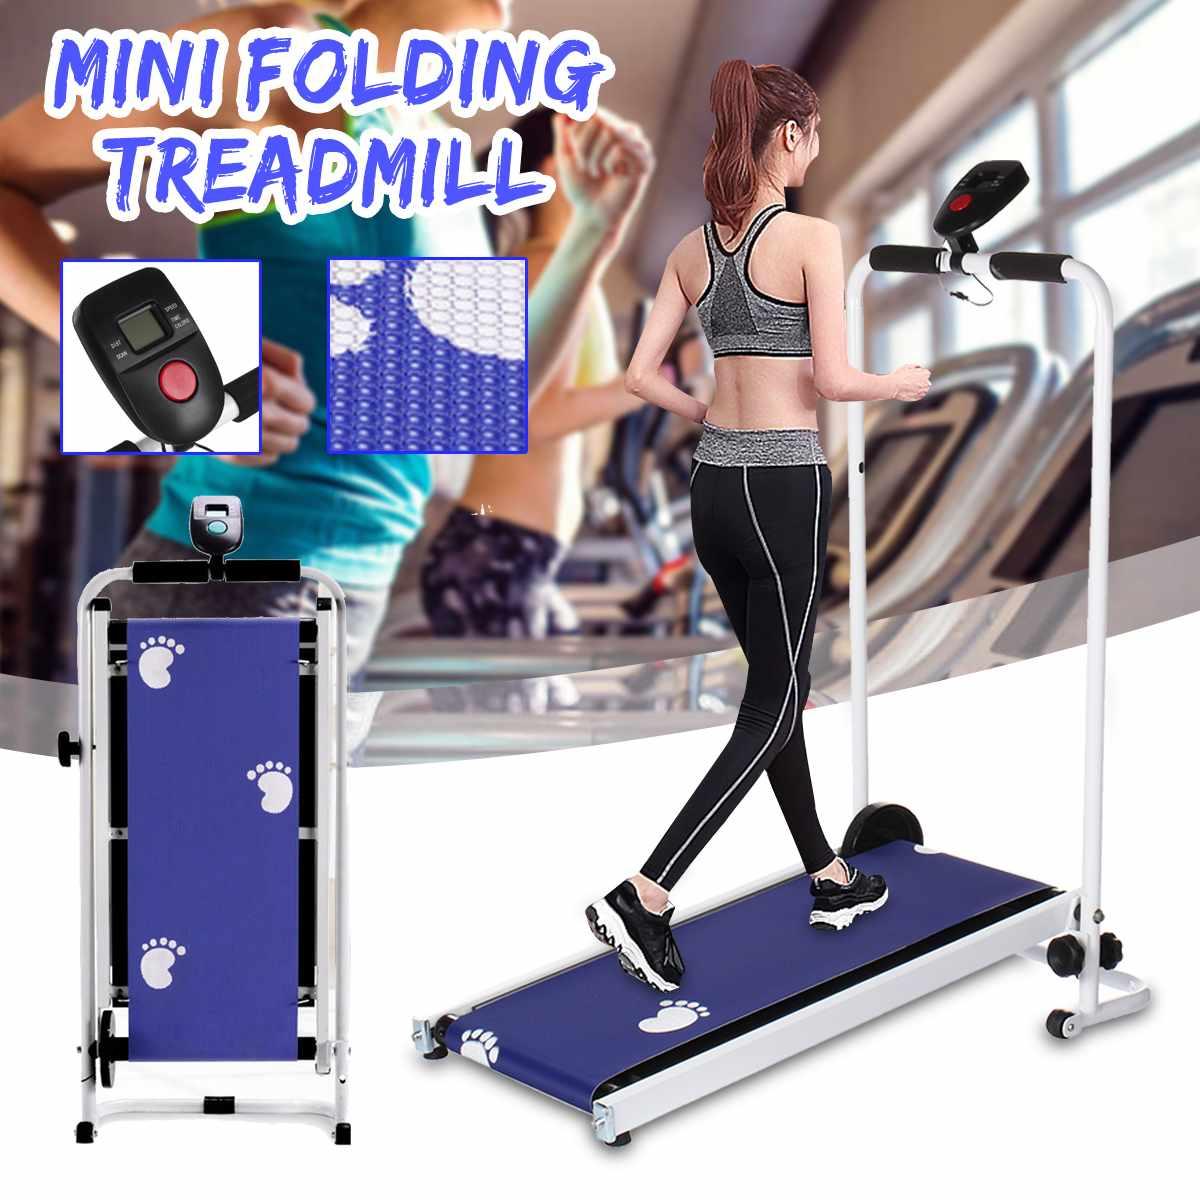 Foldable Treadmill LED Display Jog Space Walk Machine Aerobic Sport Fitness Equipment No Floor Space Easy To Move